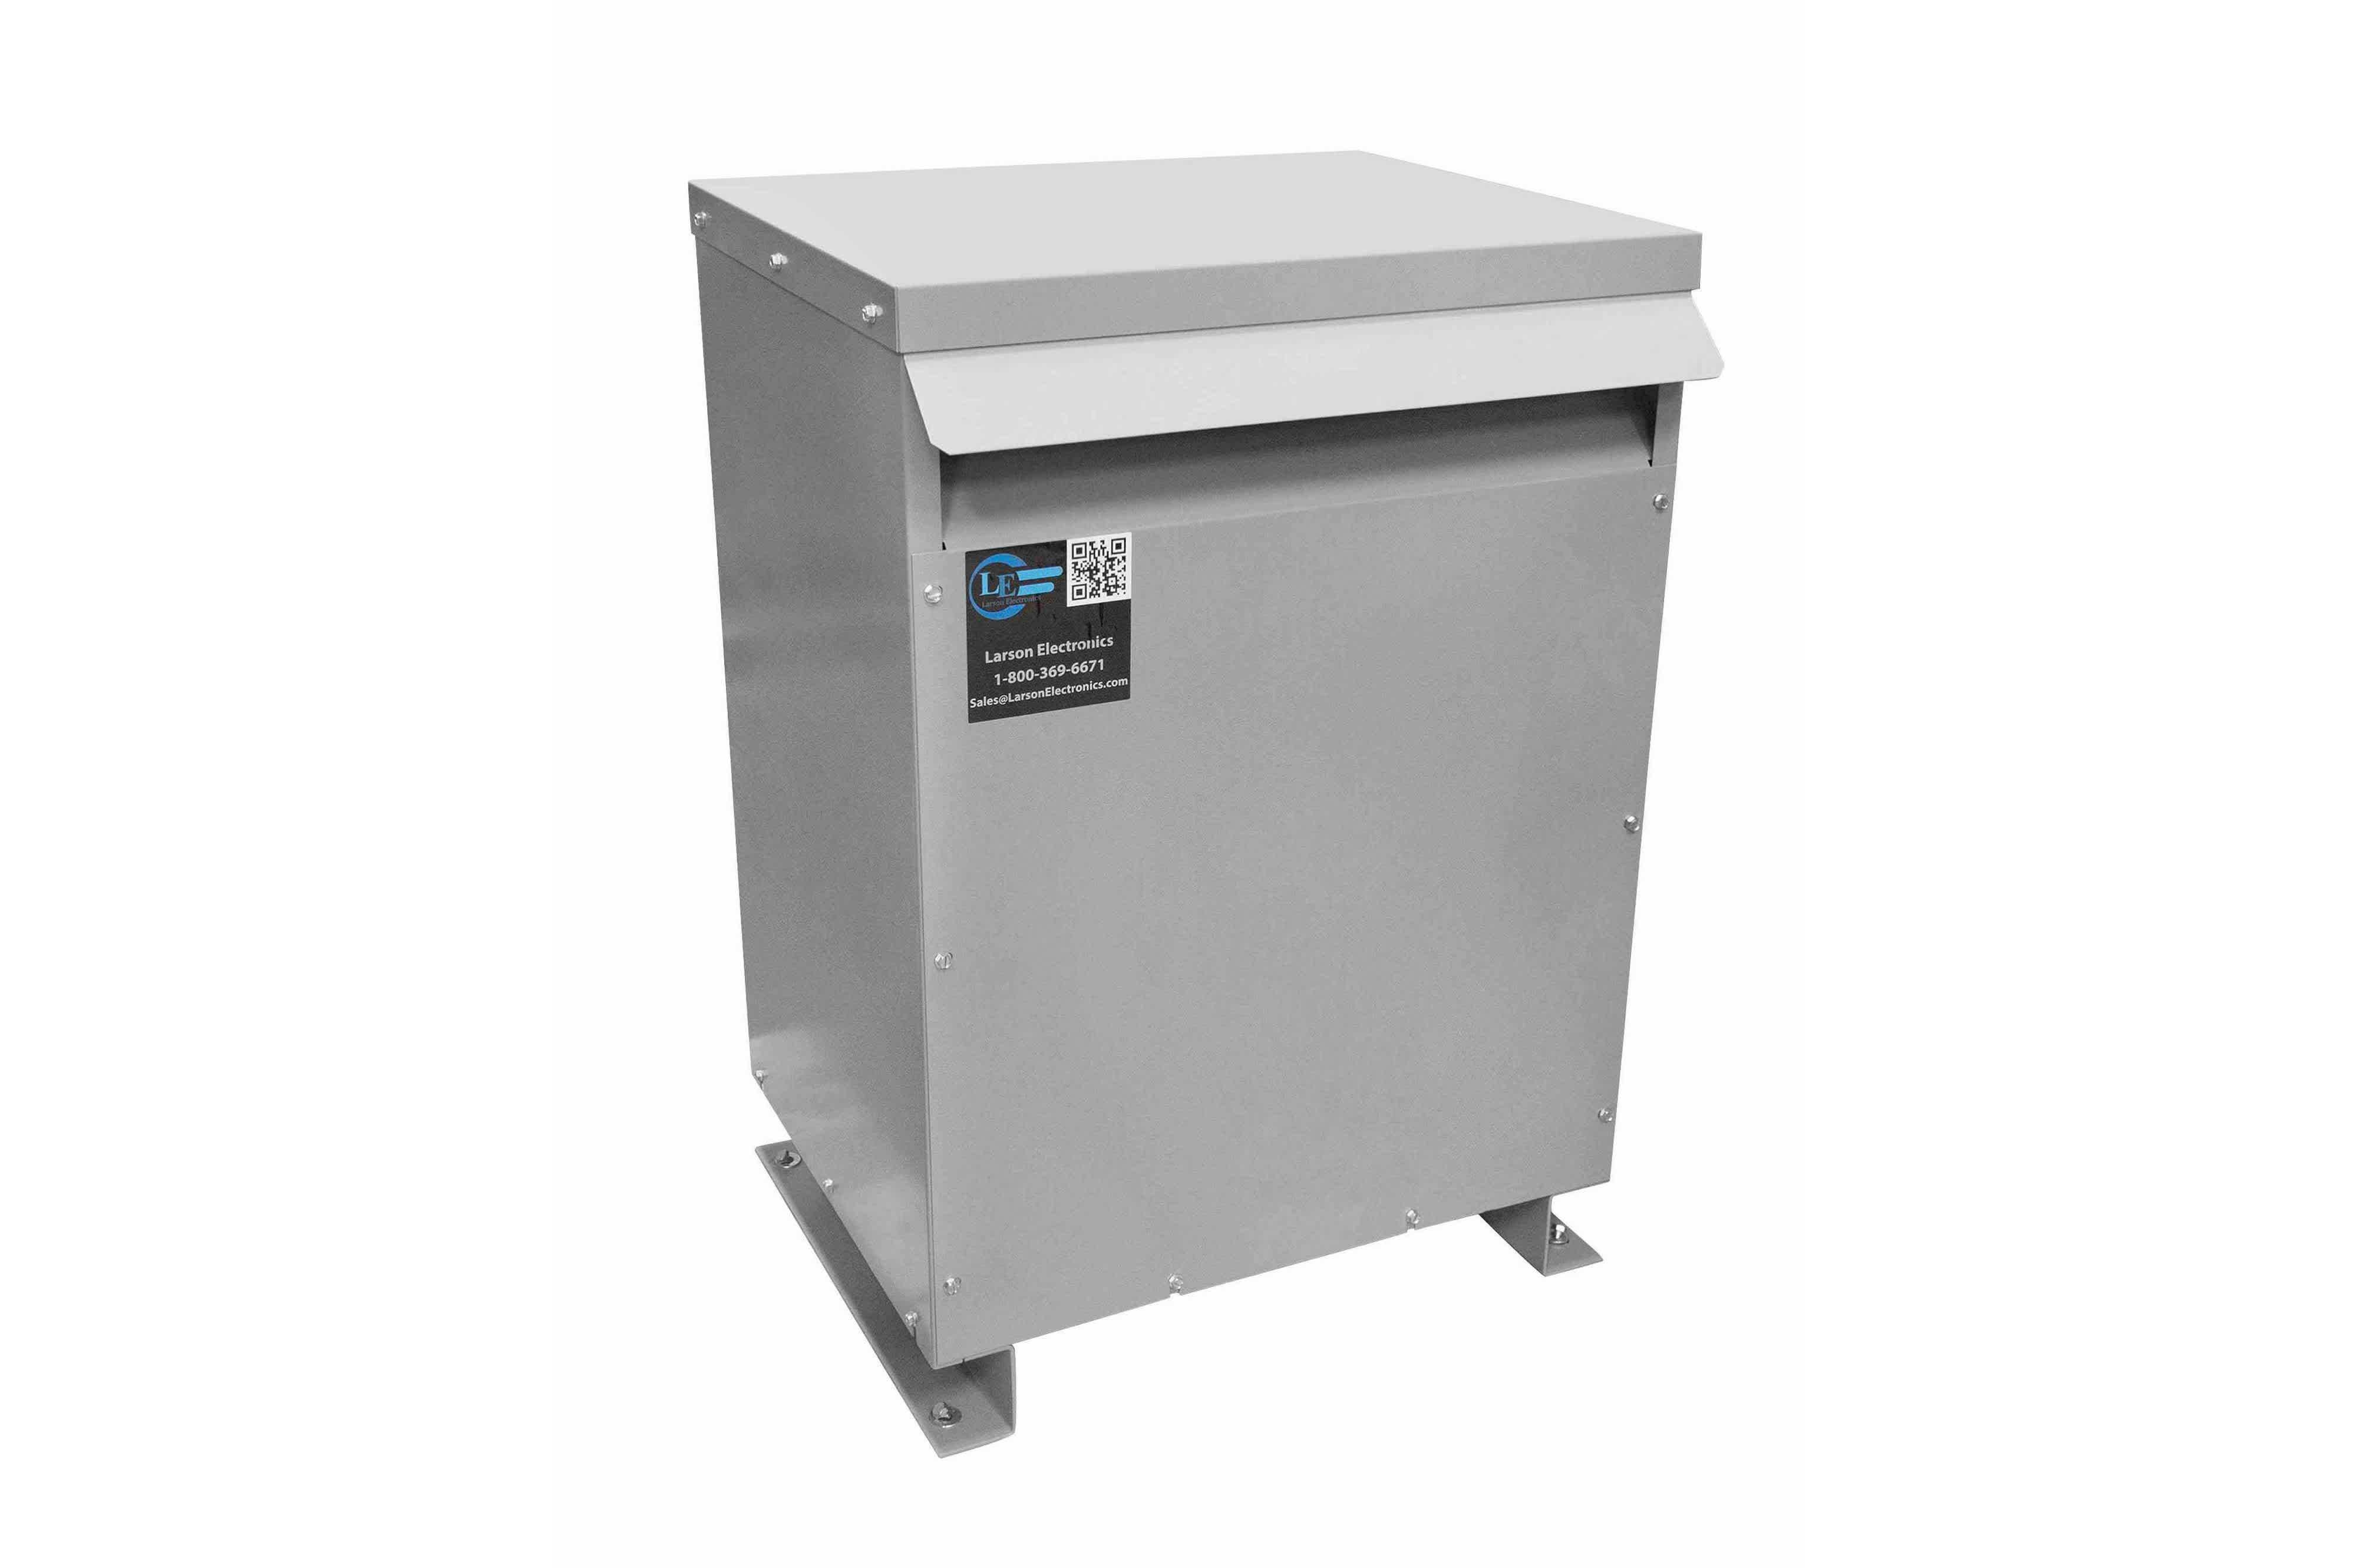 300 kVA 3PH Isolation Transformer, 460V Wye Primary, 380V Delta Secondary, N3R, Ventilated, 60 Hz